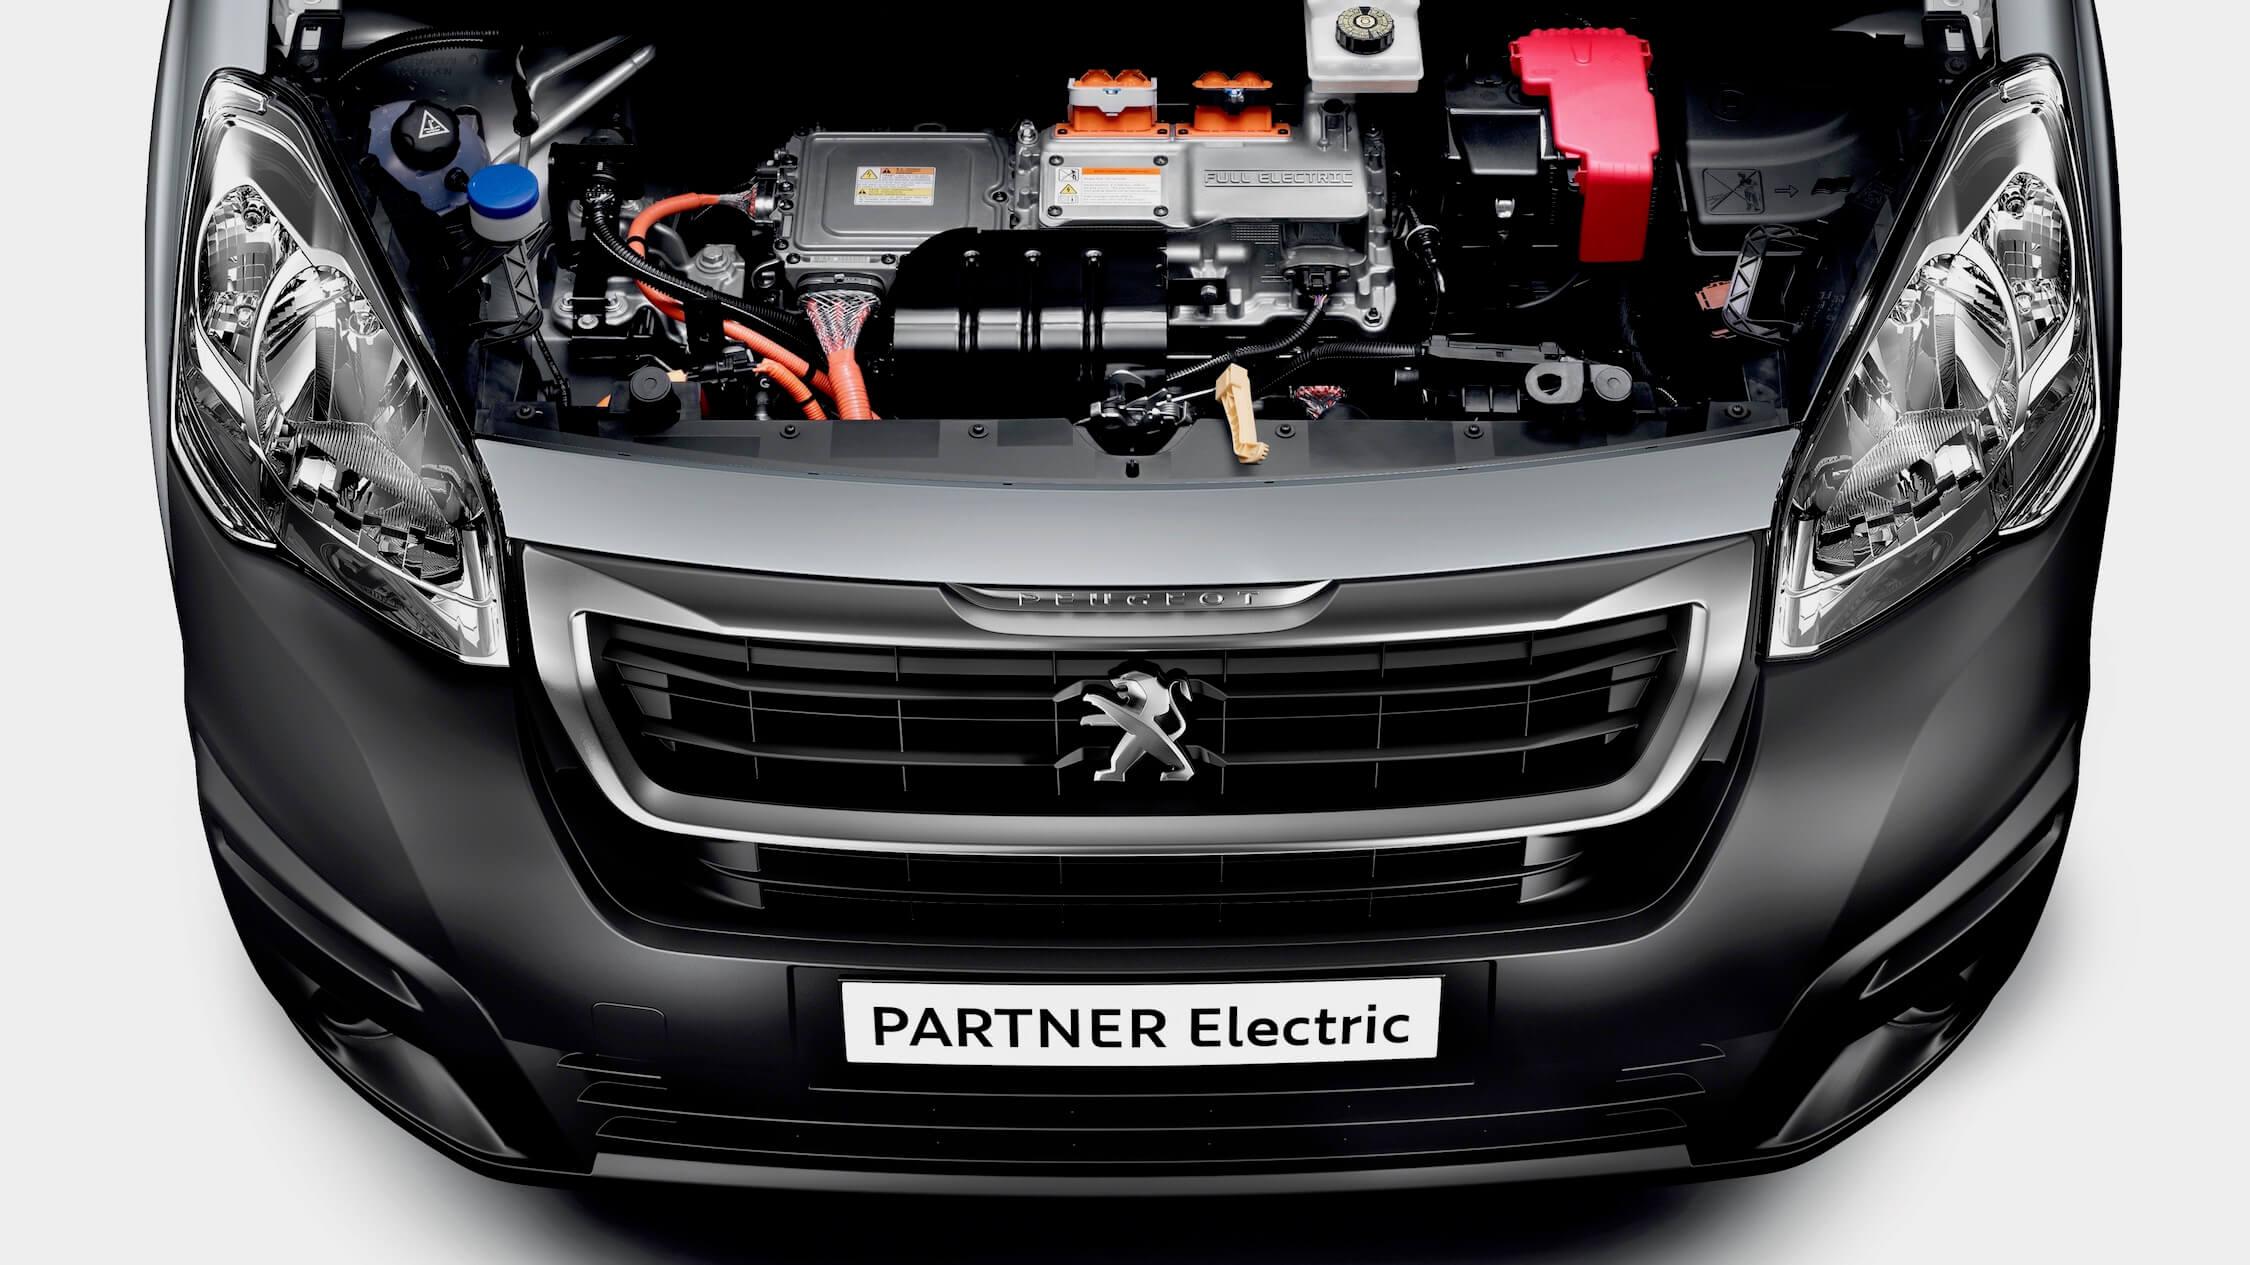 Peugeot Partner Electric motor